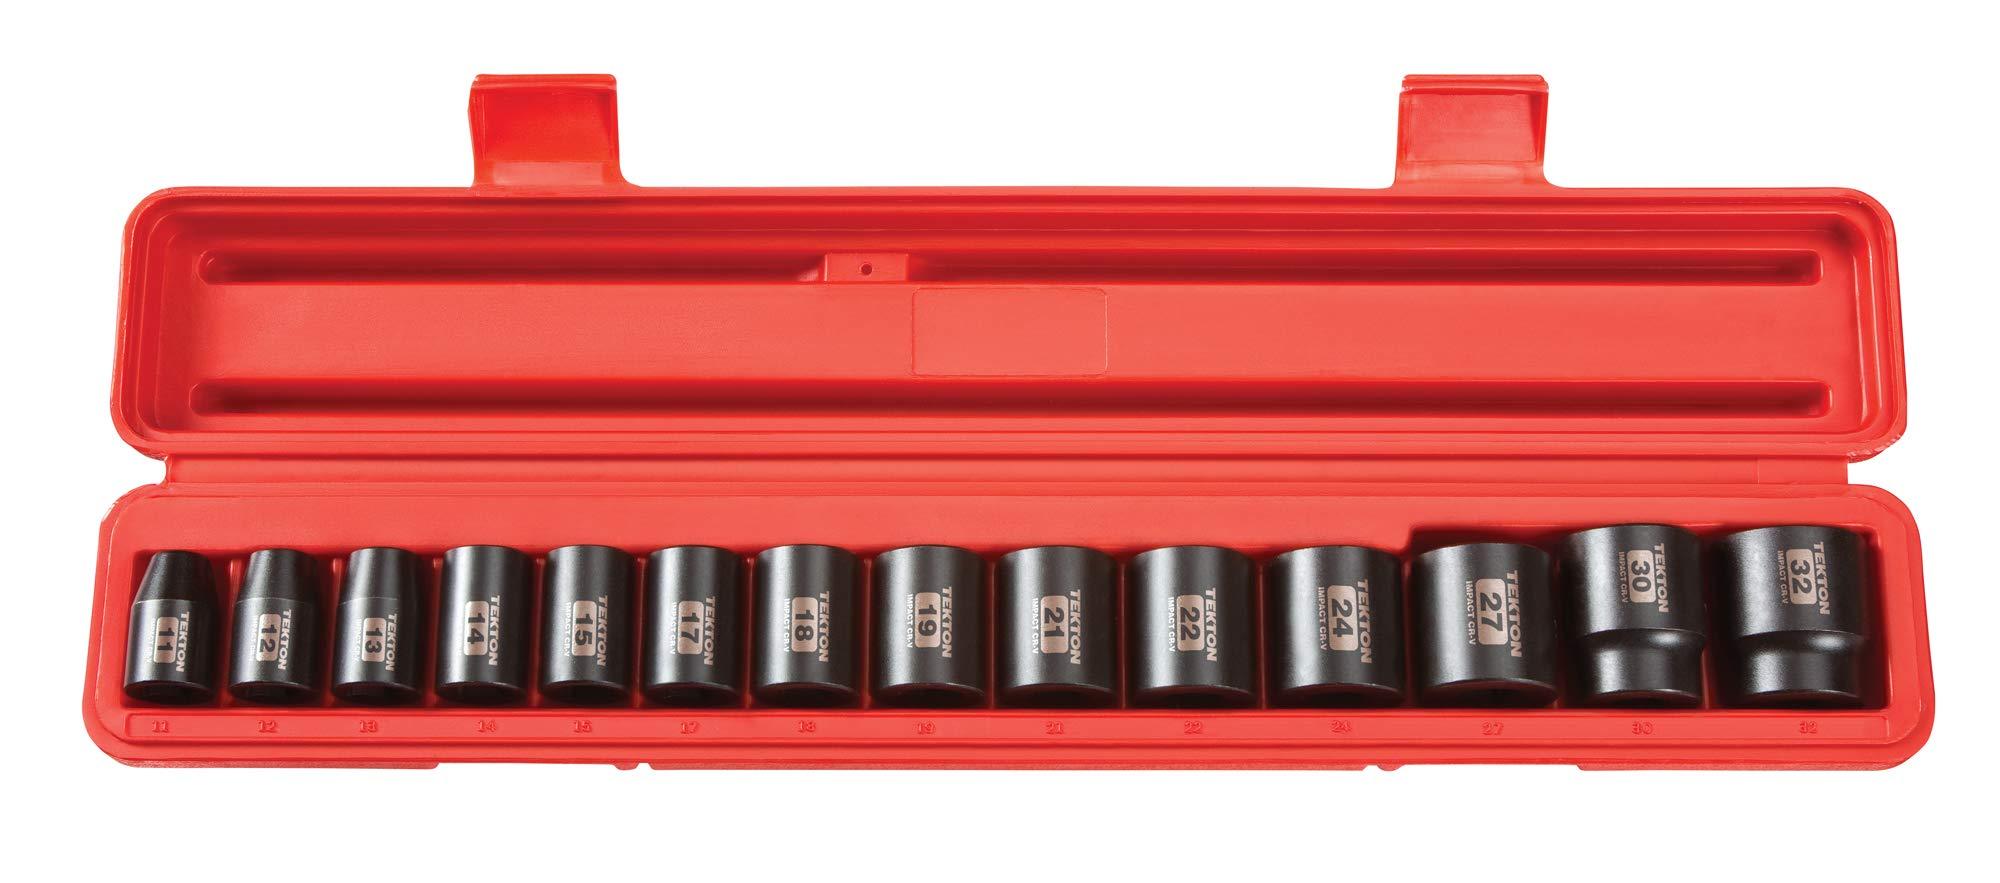 TEKTON 1/2 Inch Drive 6-Point Impact Socket Set, 14-Piece (11-32 mm) | 4817